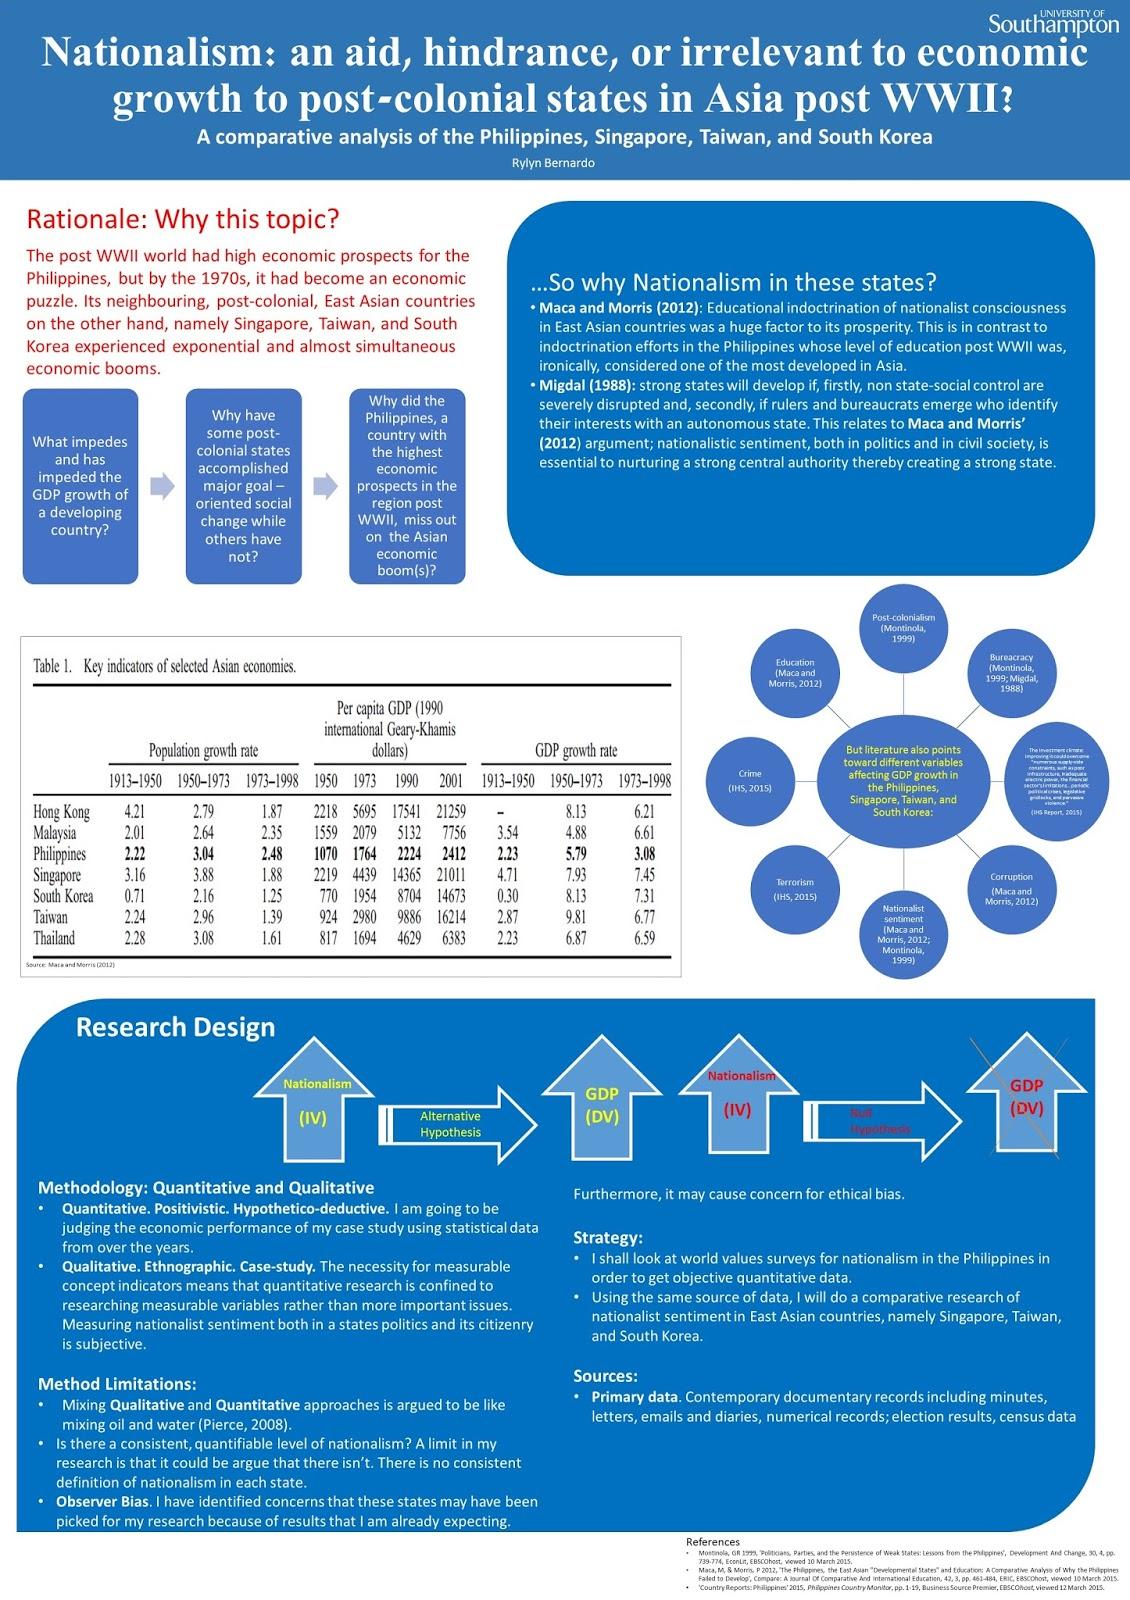 Buy a dissertation online abstract international